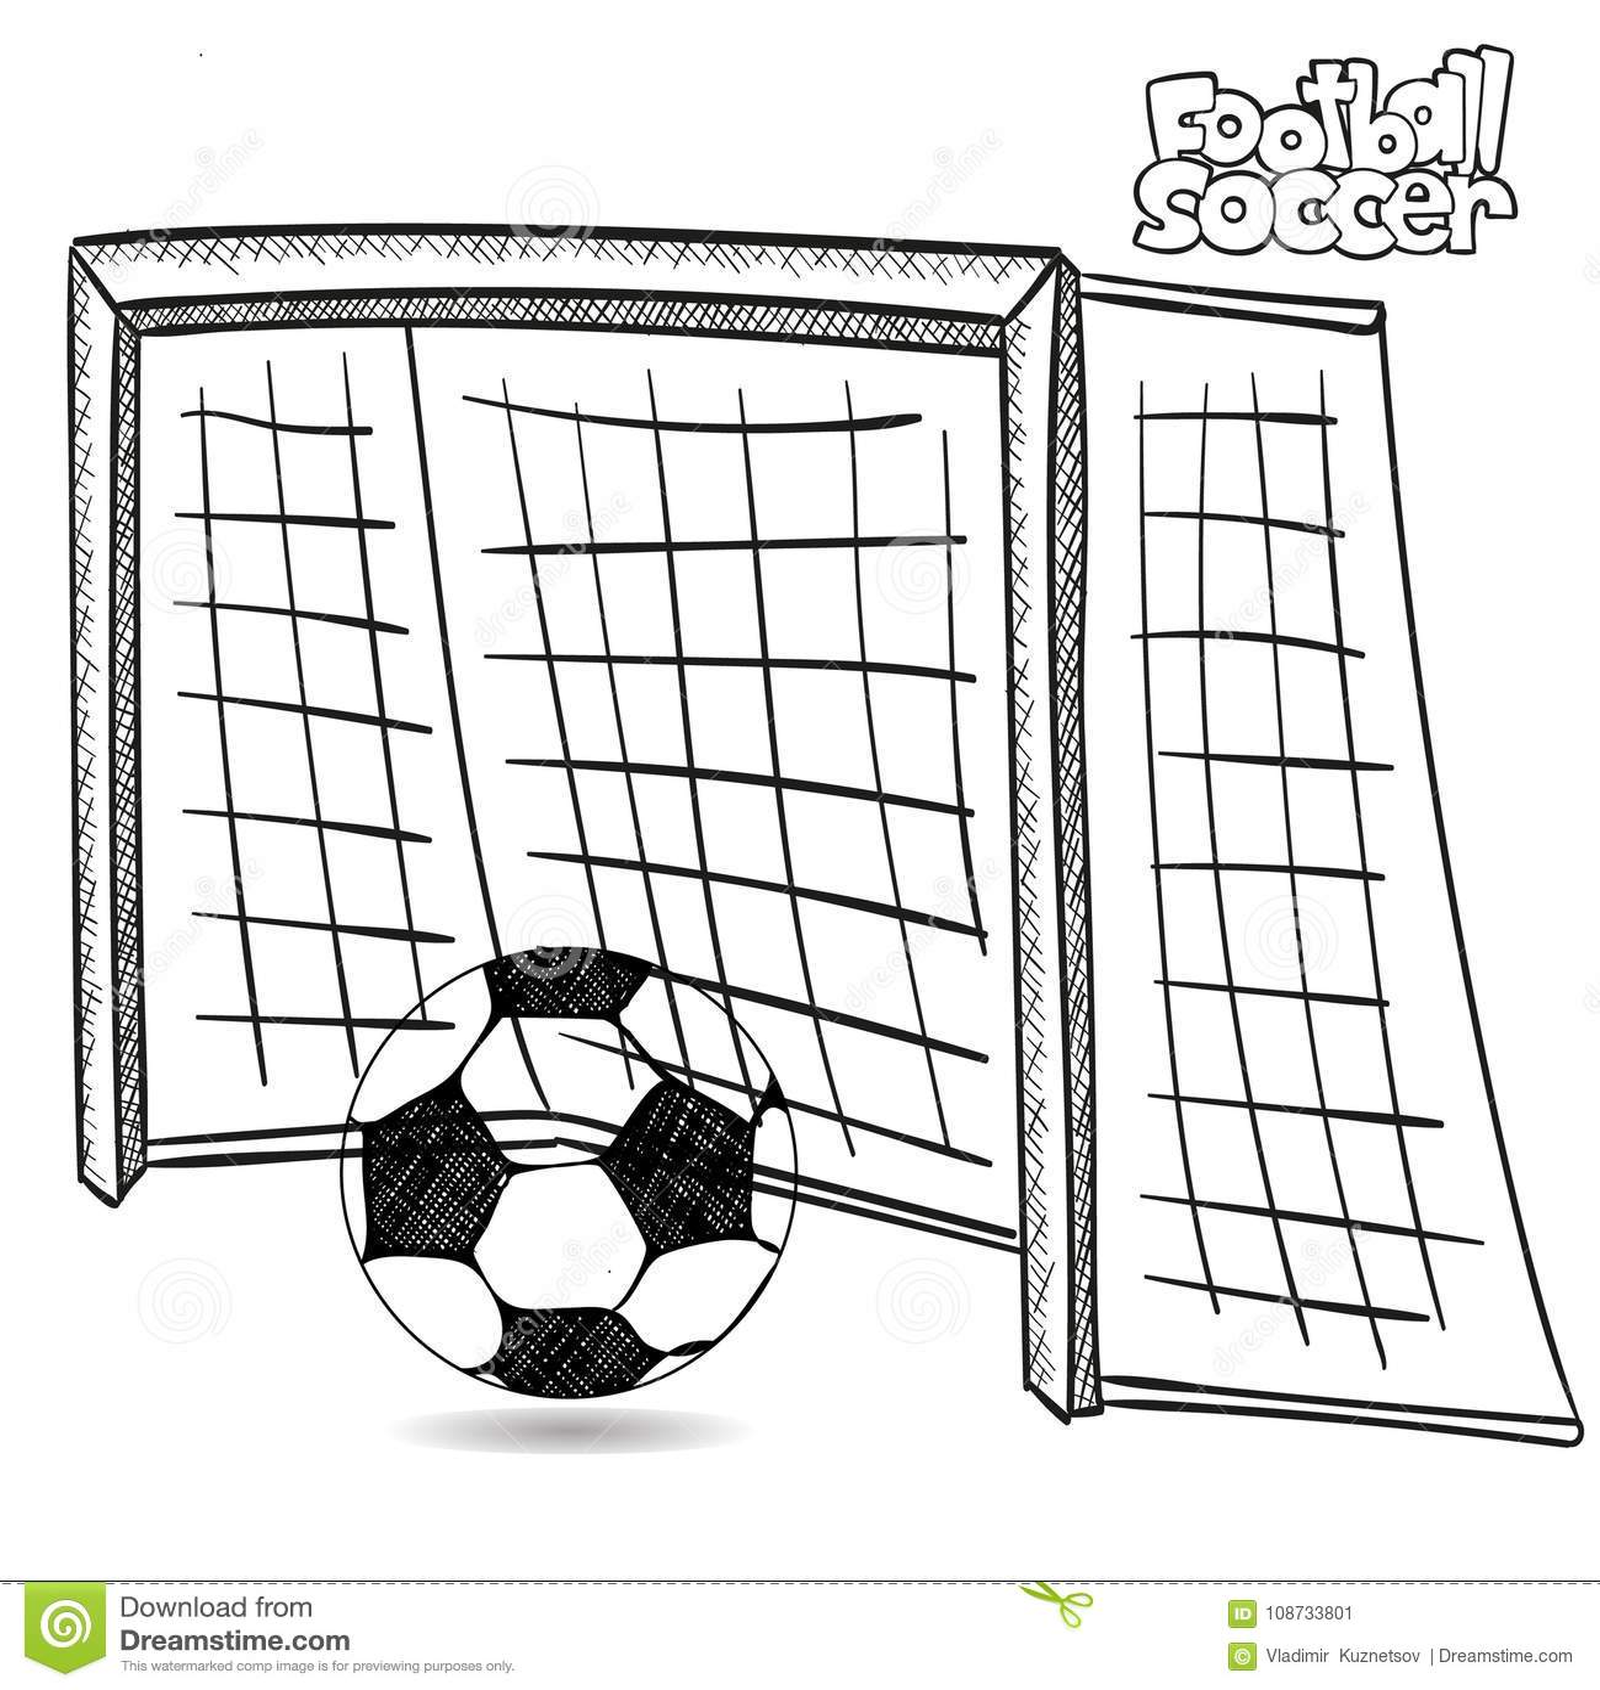 Ball drawing soccer stock illustrations 5 588 ball drawing soccer stock illustrations vectors - Comment dessiner un but de foot ...